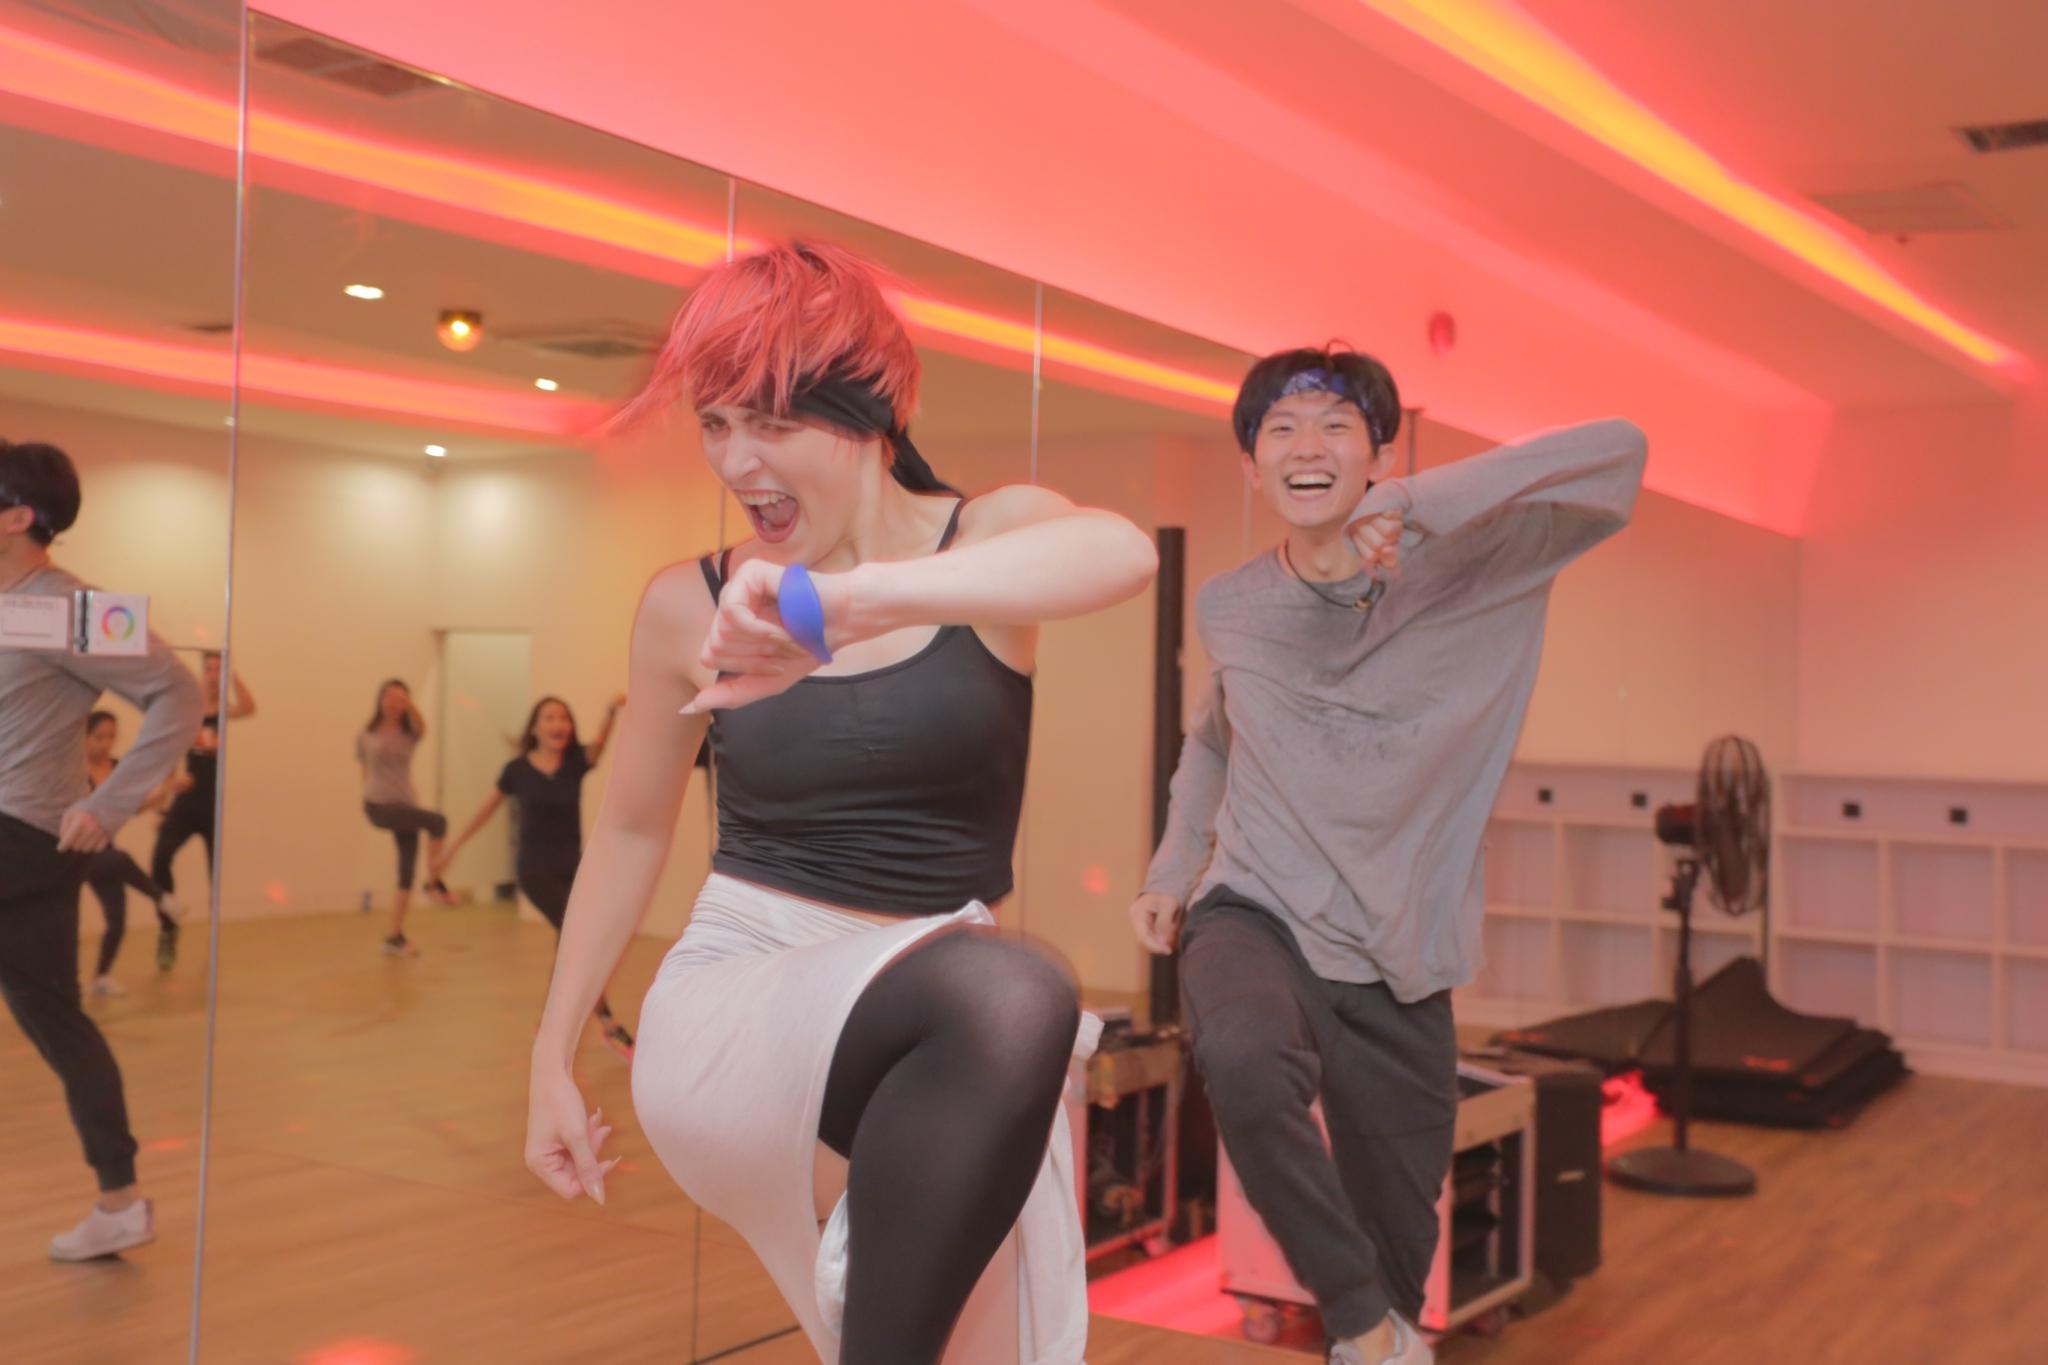 WE Duo fit dance